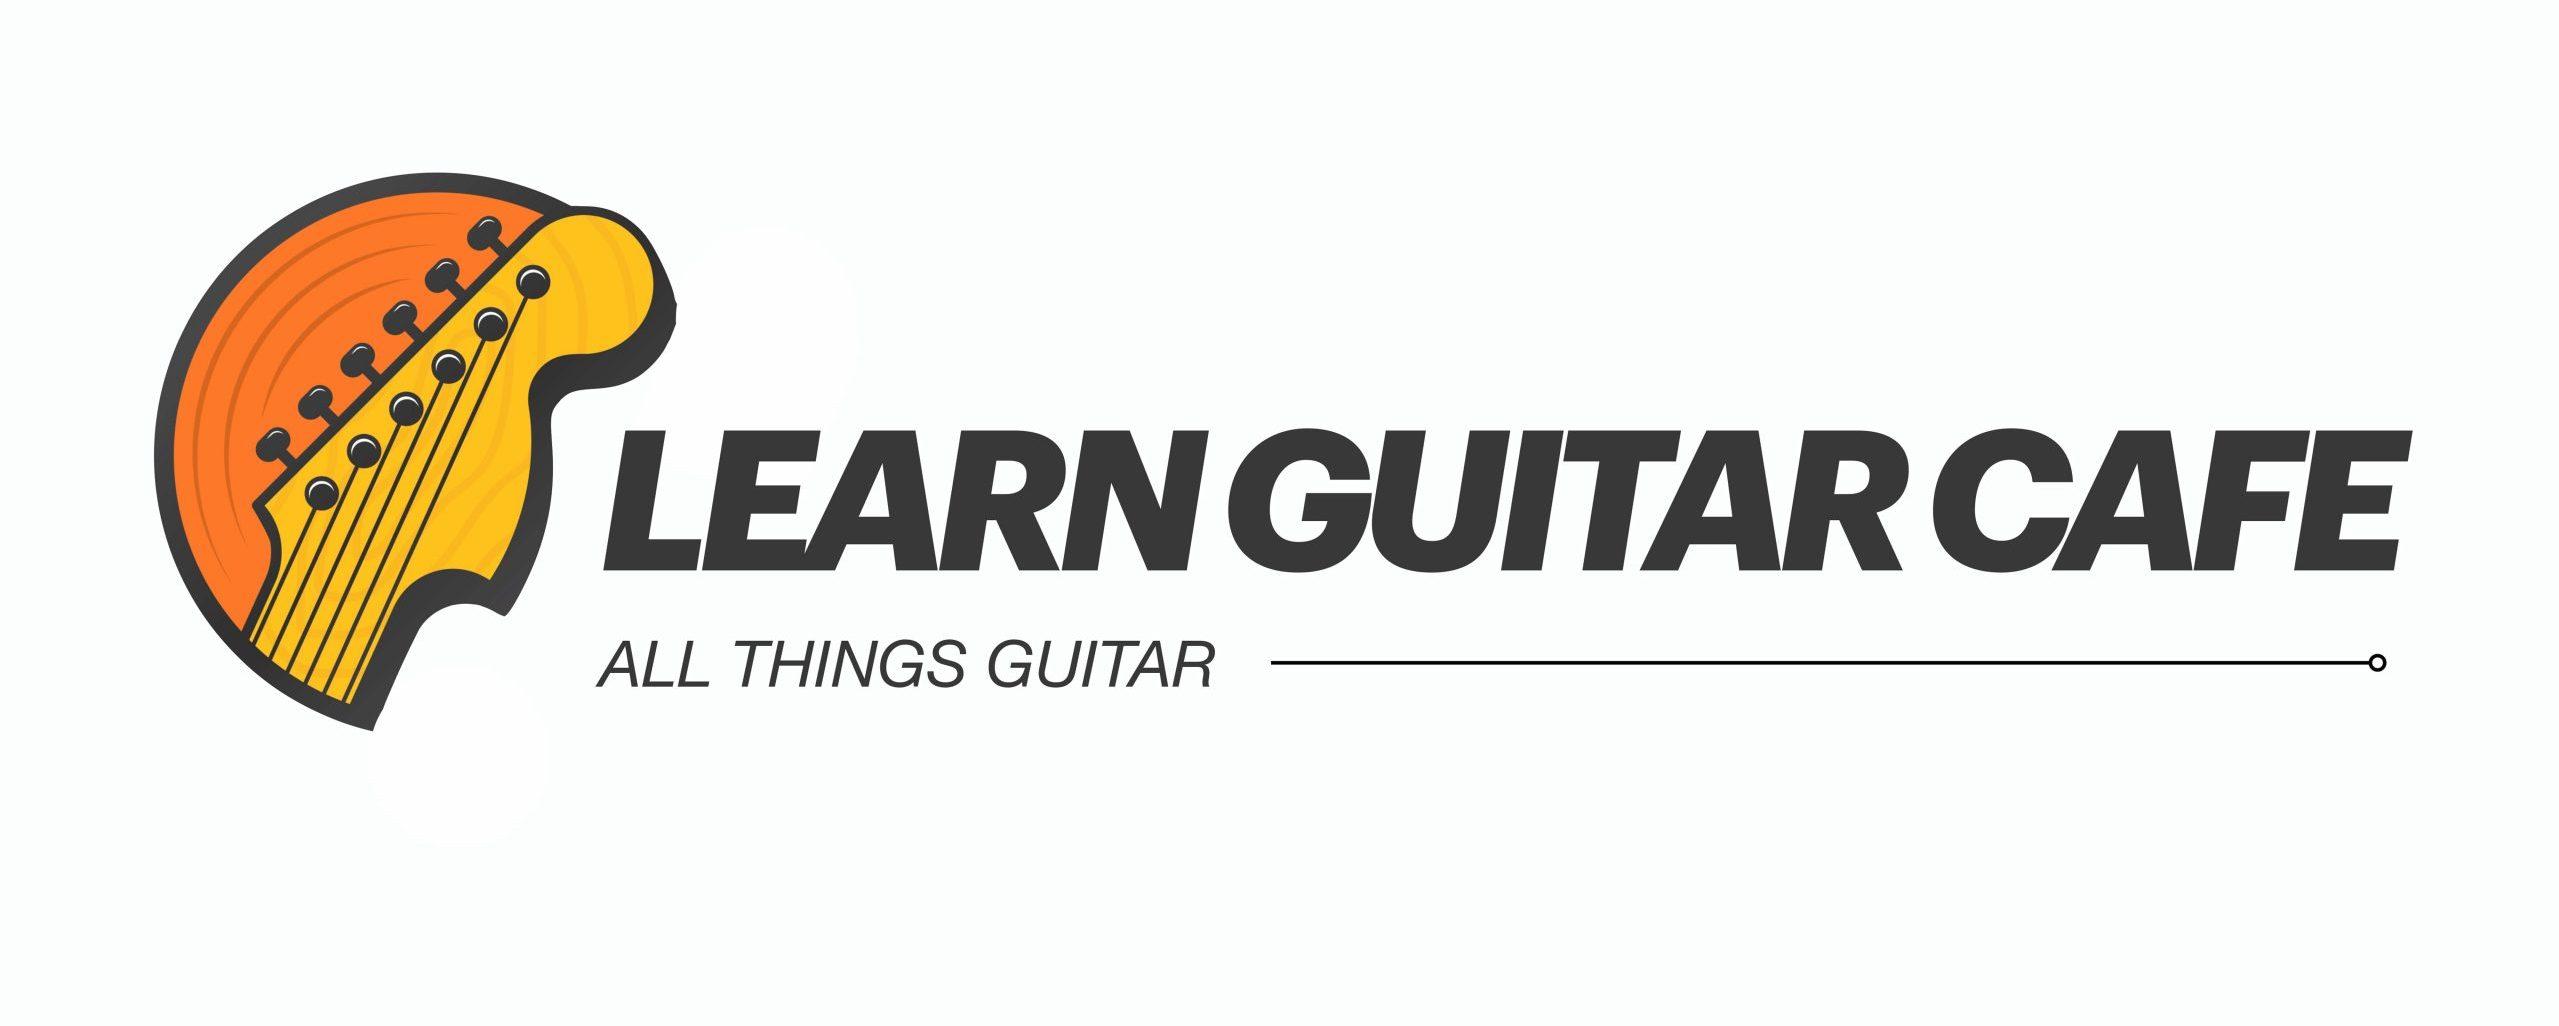 Learn Guitar Cafe